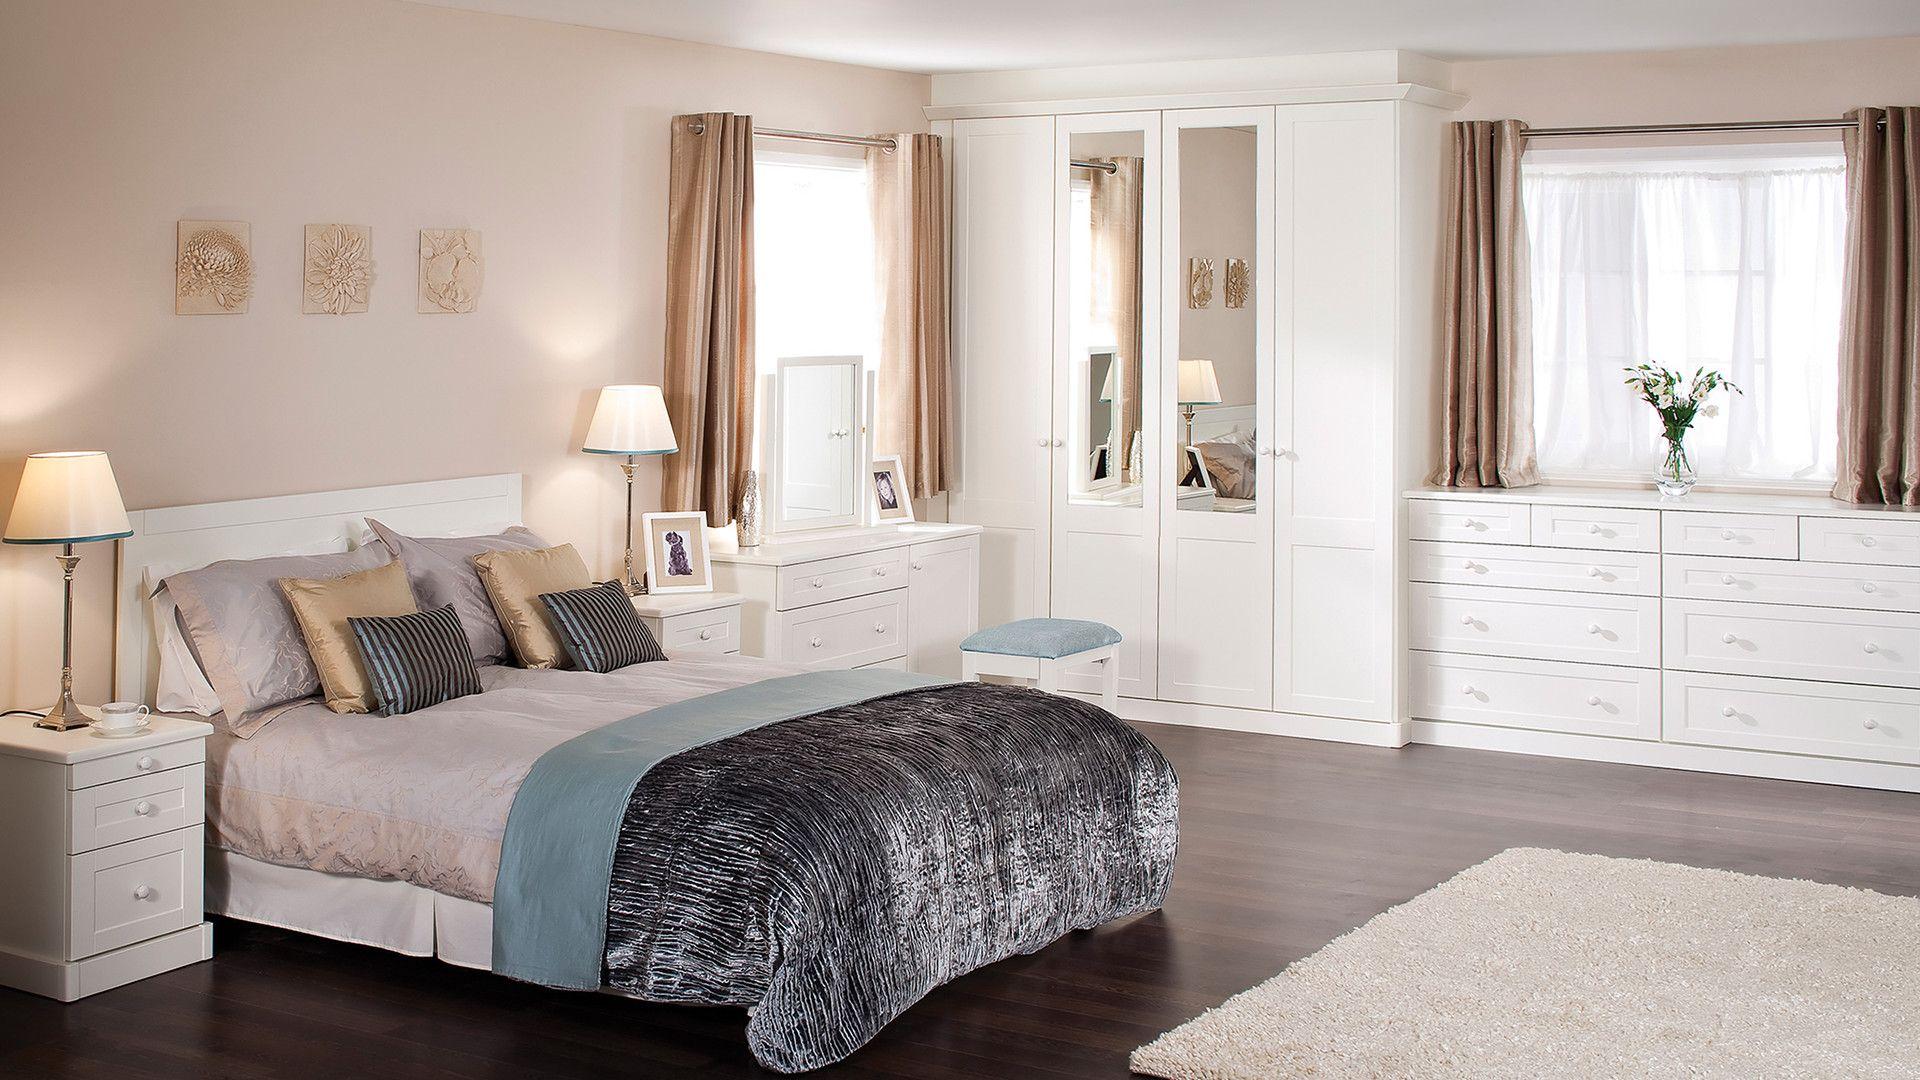 Amore 171 Fitted Bedroom Furniture Wardrobes UK